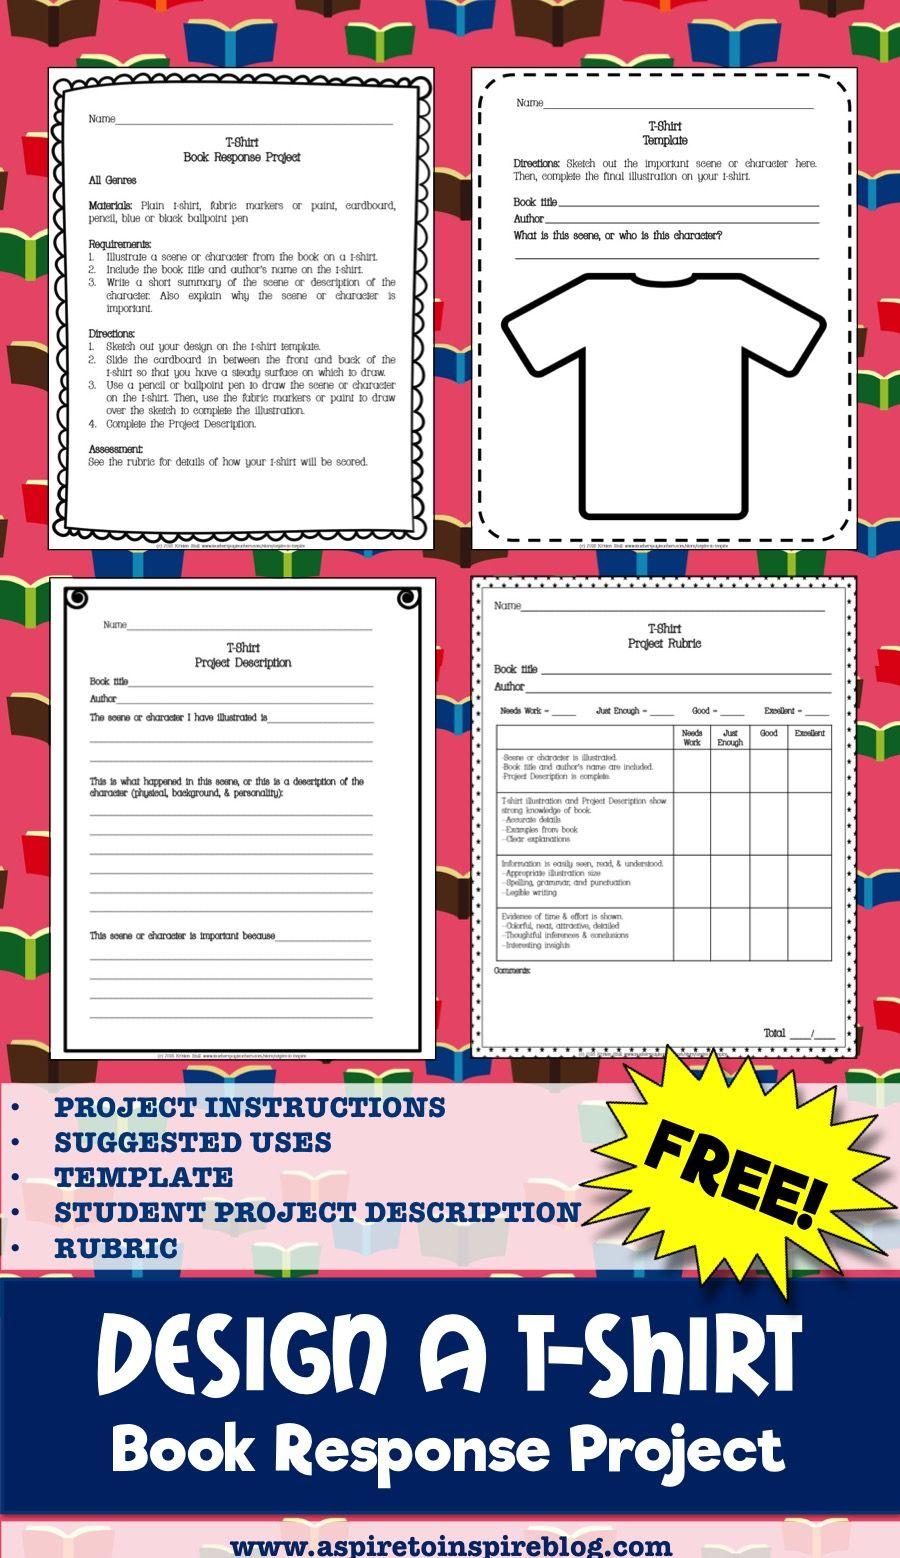 Shirt design rubric - Free Design A T Shirt Book Reponse Project